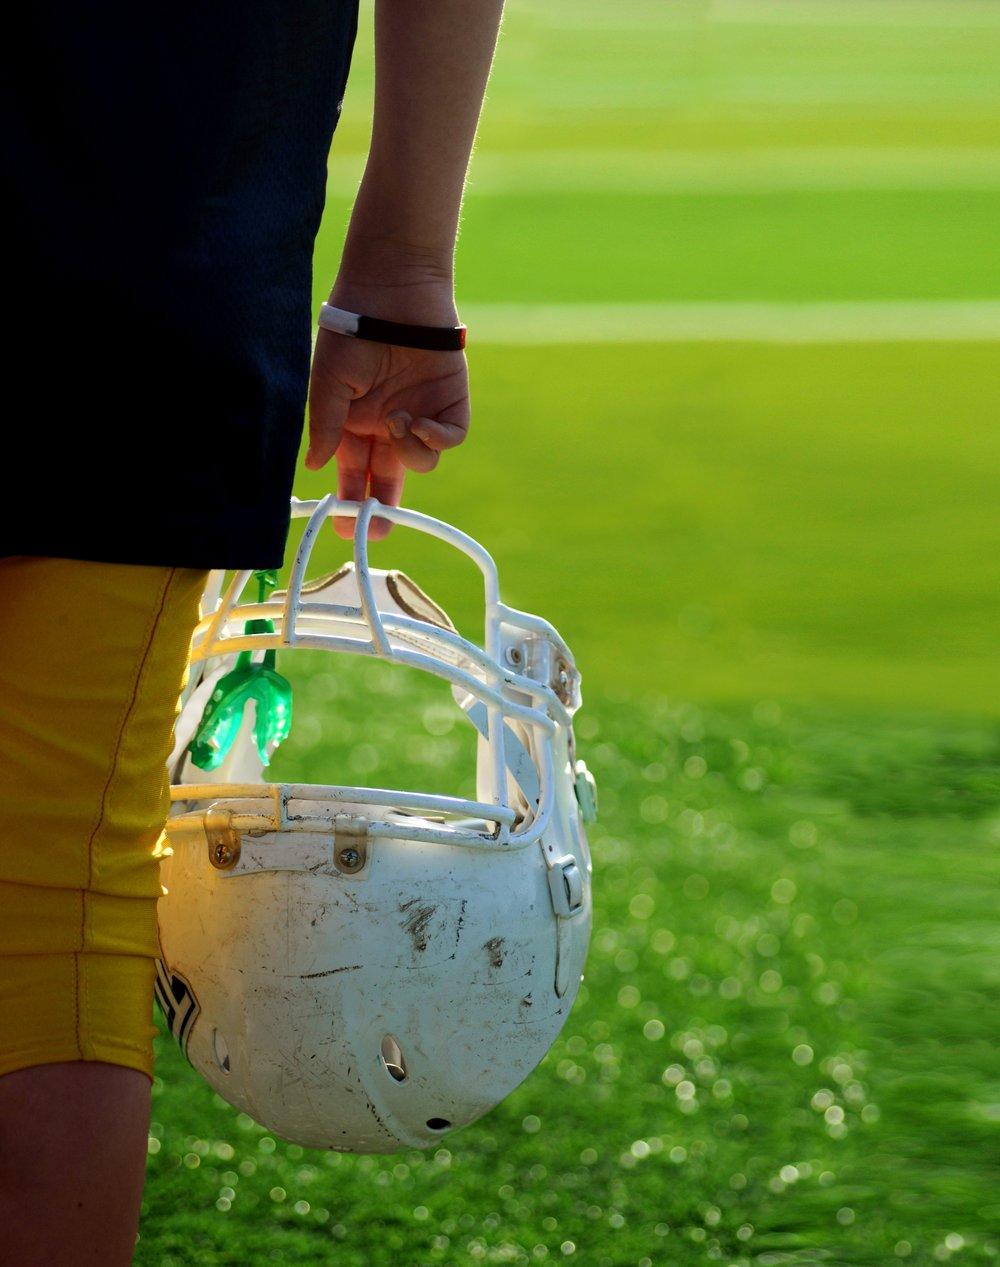 football helmet ben-hershey-560952-unsplash.jpg